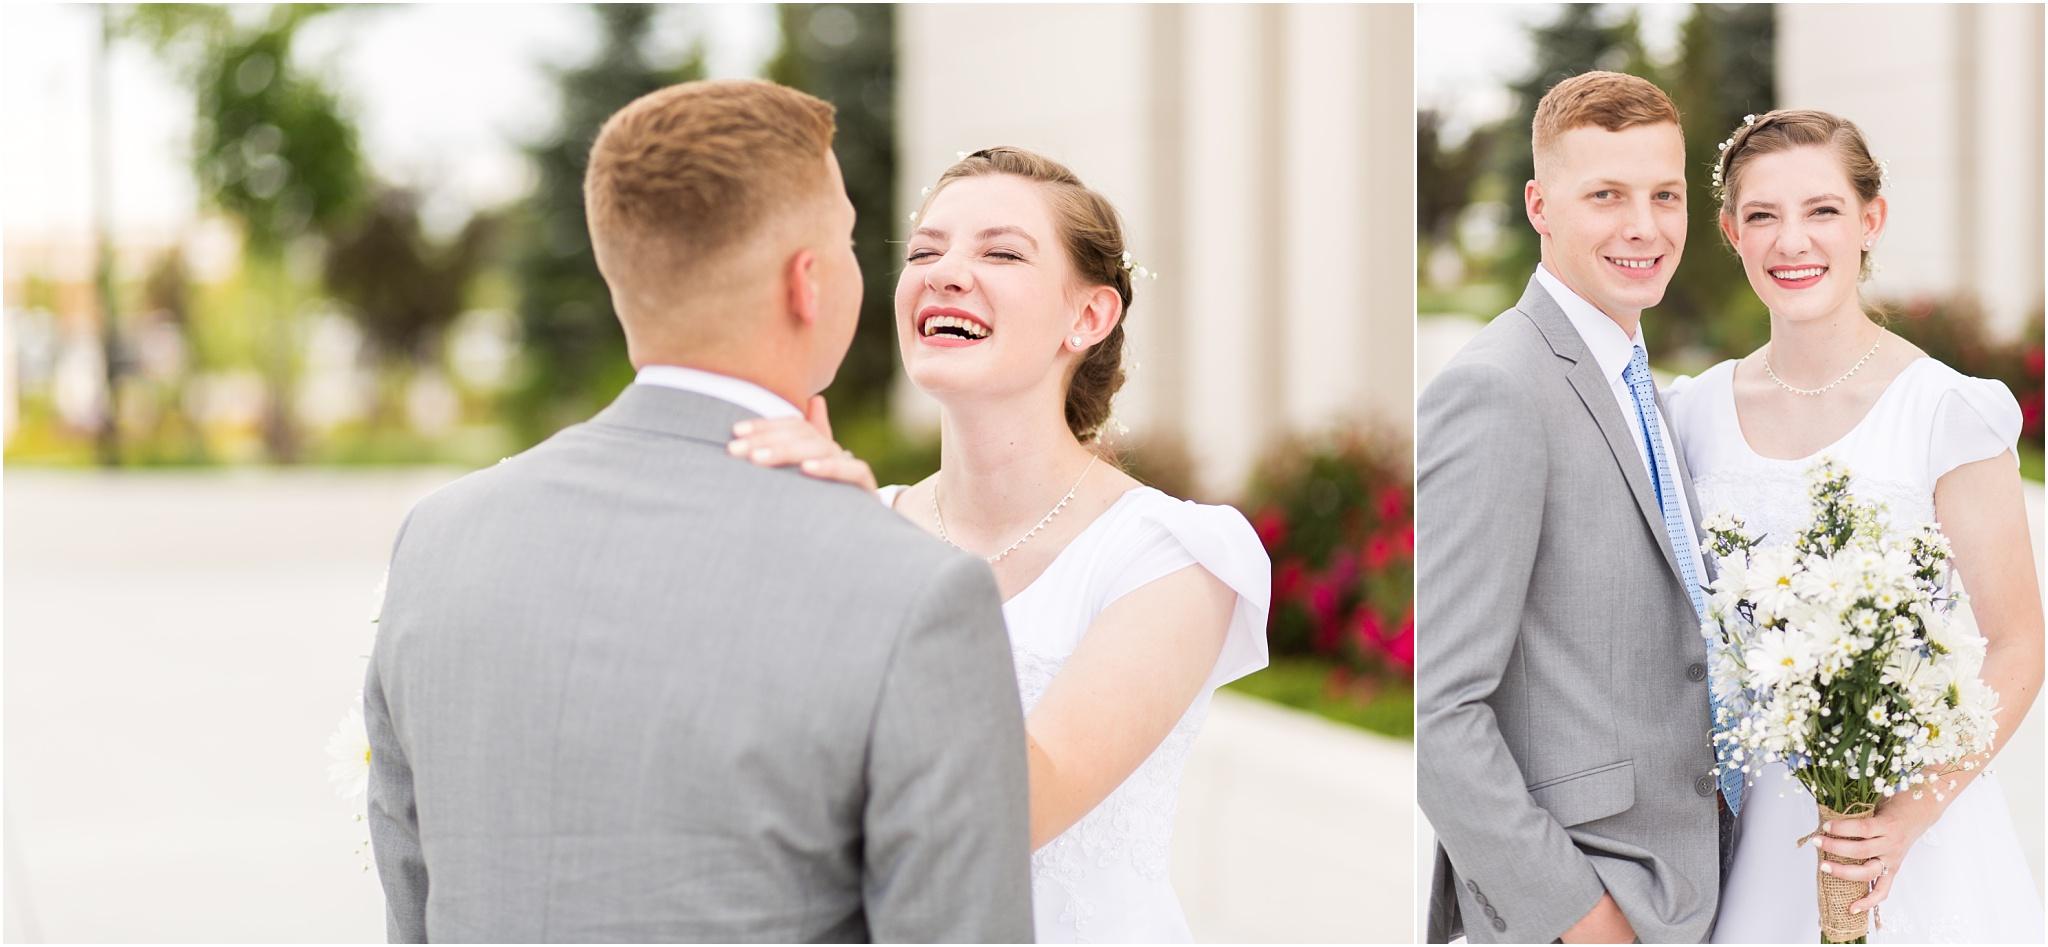 Wedding Photography_Meridian Idaho Temple_Boise Idaho_Leah Southwick Photography_0033.jpg